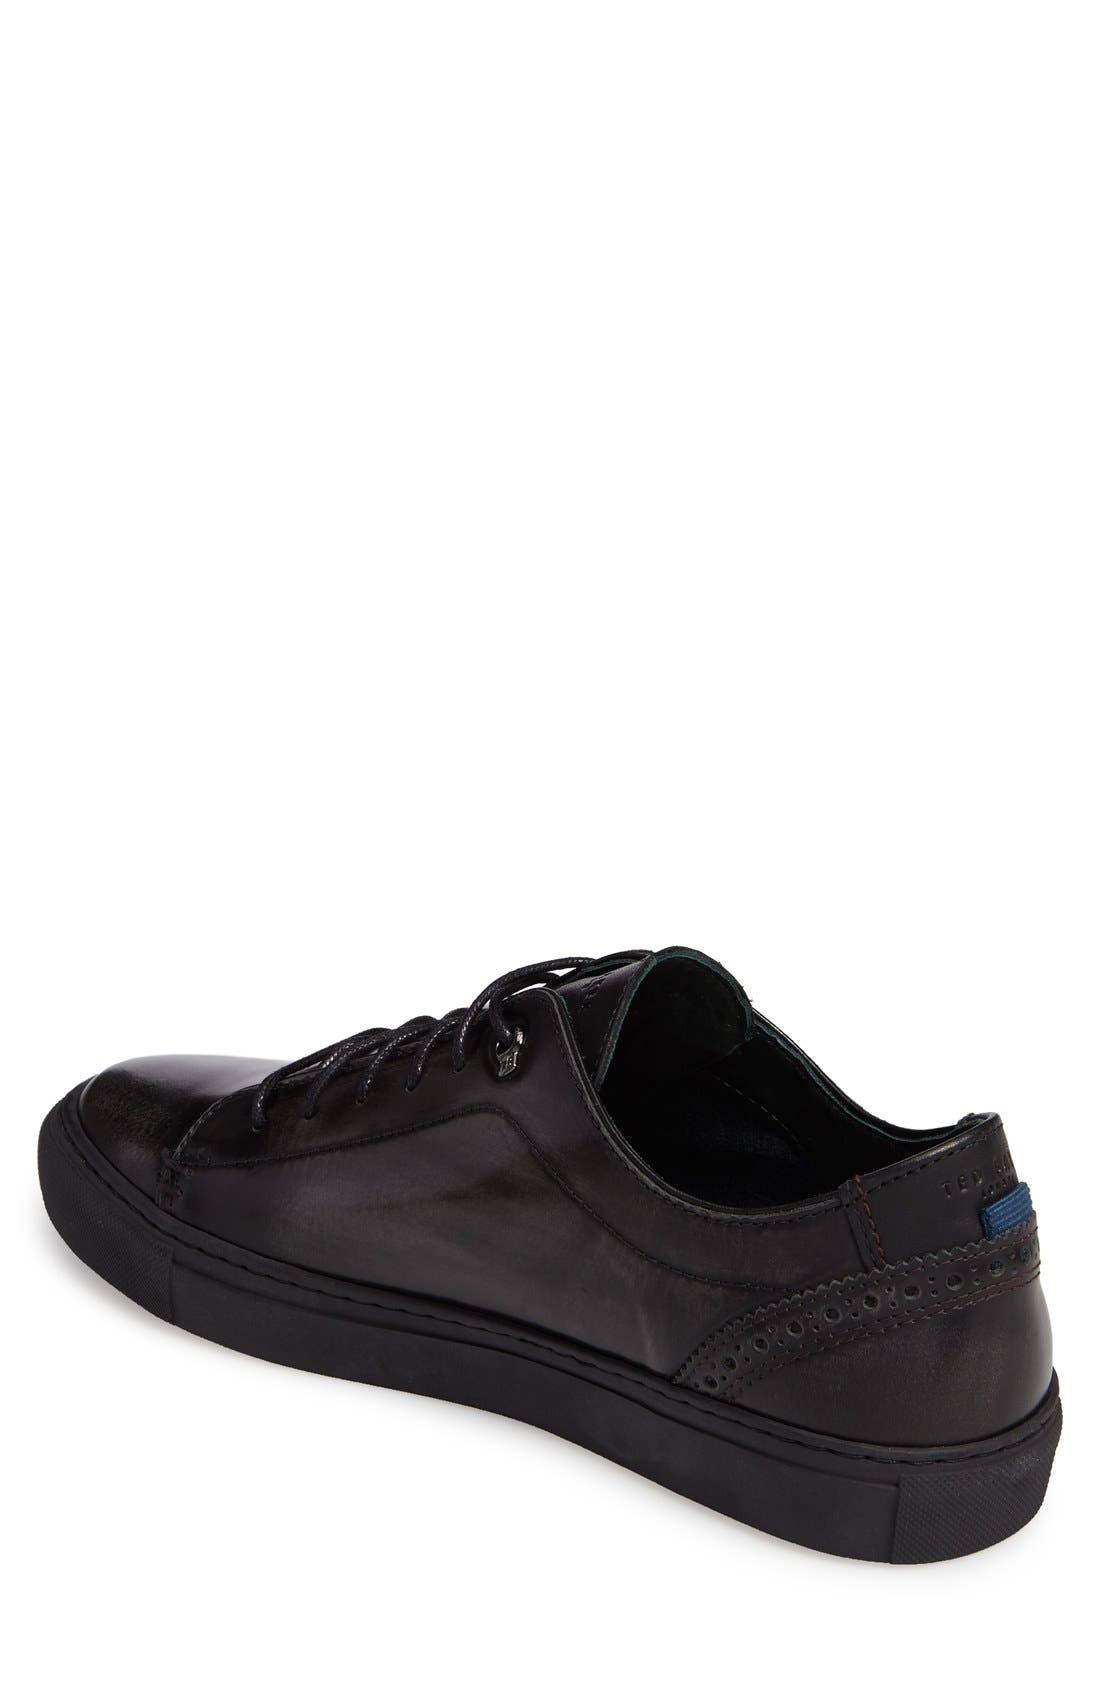 'Kiing Classic' Sneaker,                             Alternate thumbnail 58, color,